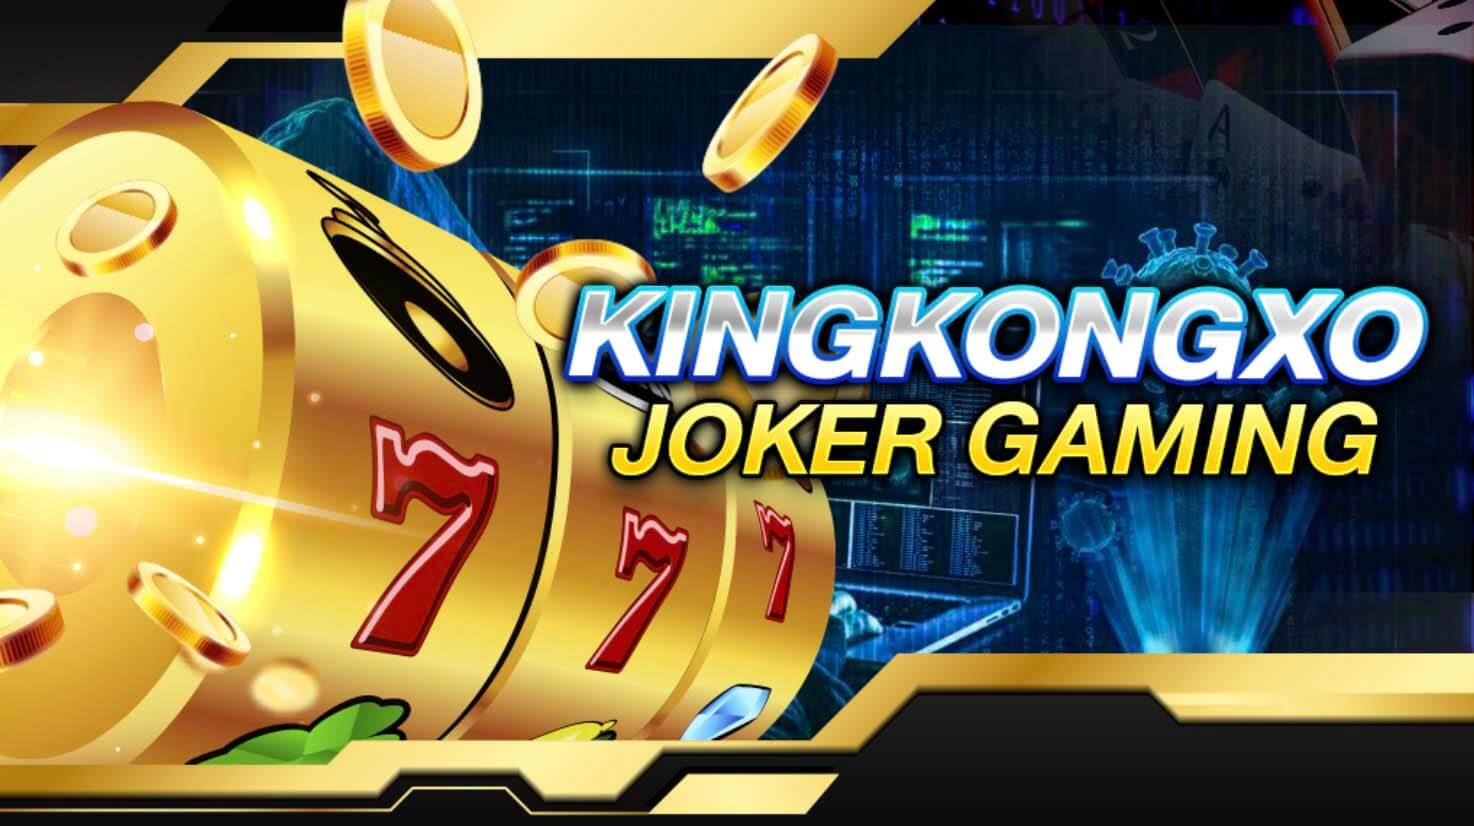 Kingkongxo joker